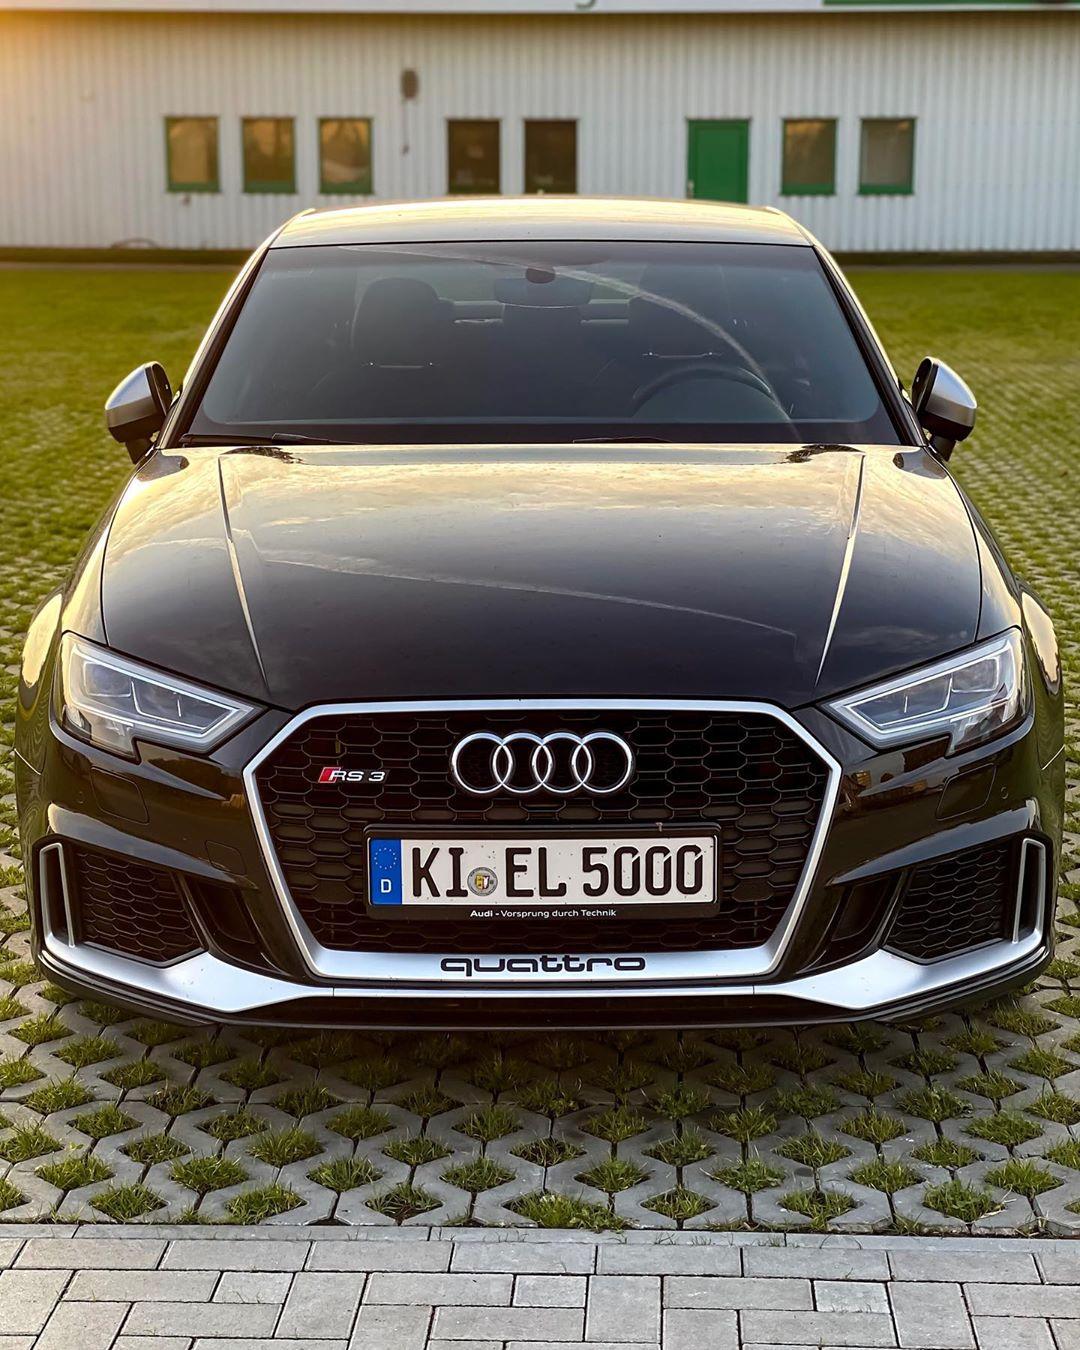 Only 4 more days😳…unbelievable nasty sounds out of this 5-pott💥🤩 #Audi rs#audi #audisport #rs3 #rs3limousine #rs3sedan #rs38v #pantherschwarz #pantherblack #blackbeauty #blackpanther #automannsgarage #automanntv